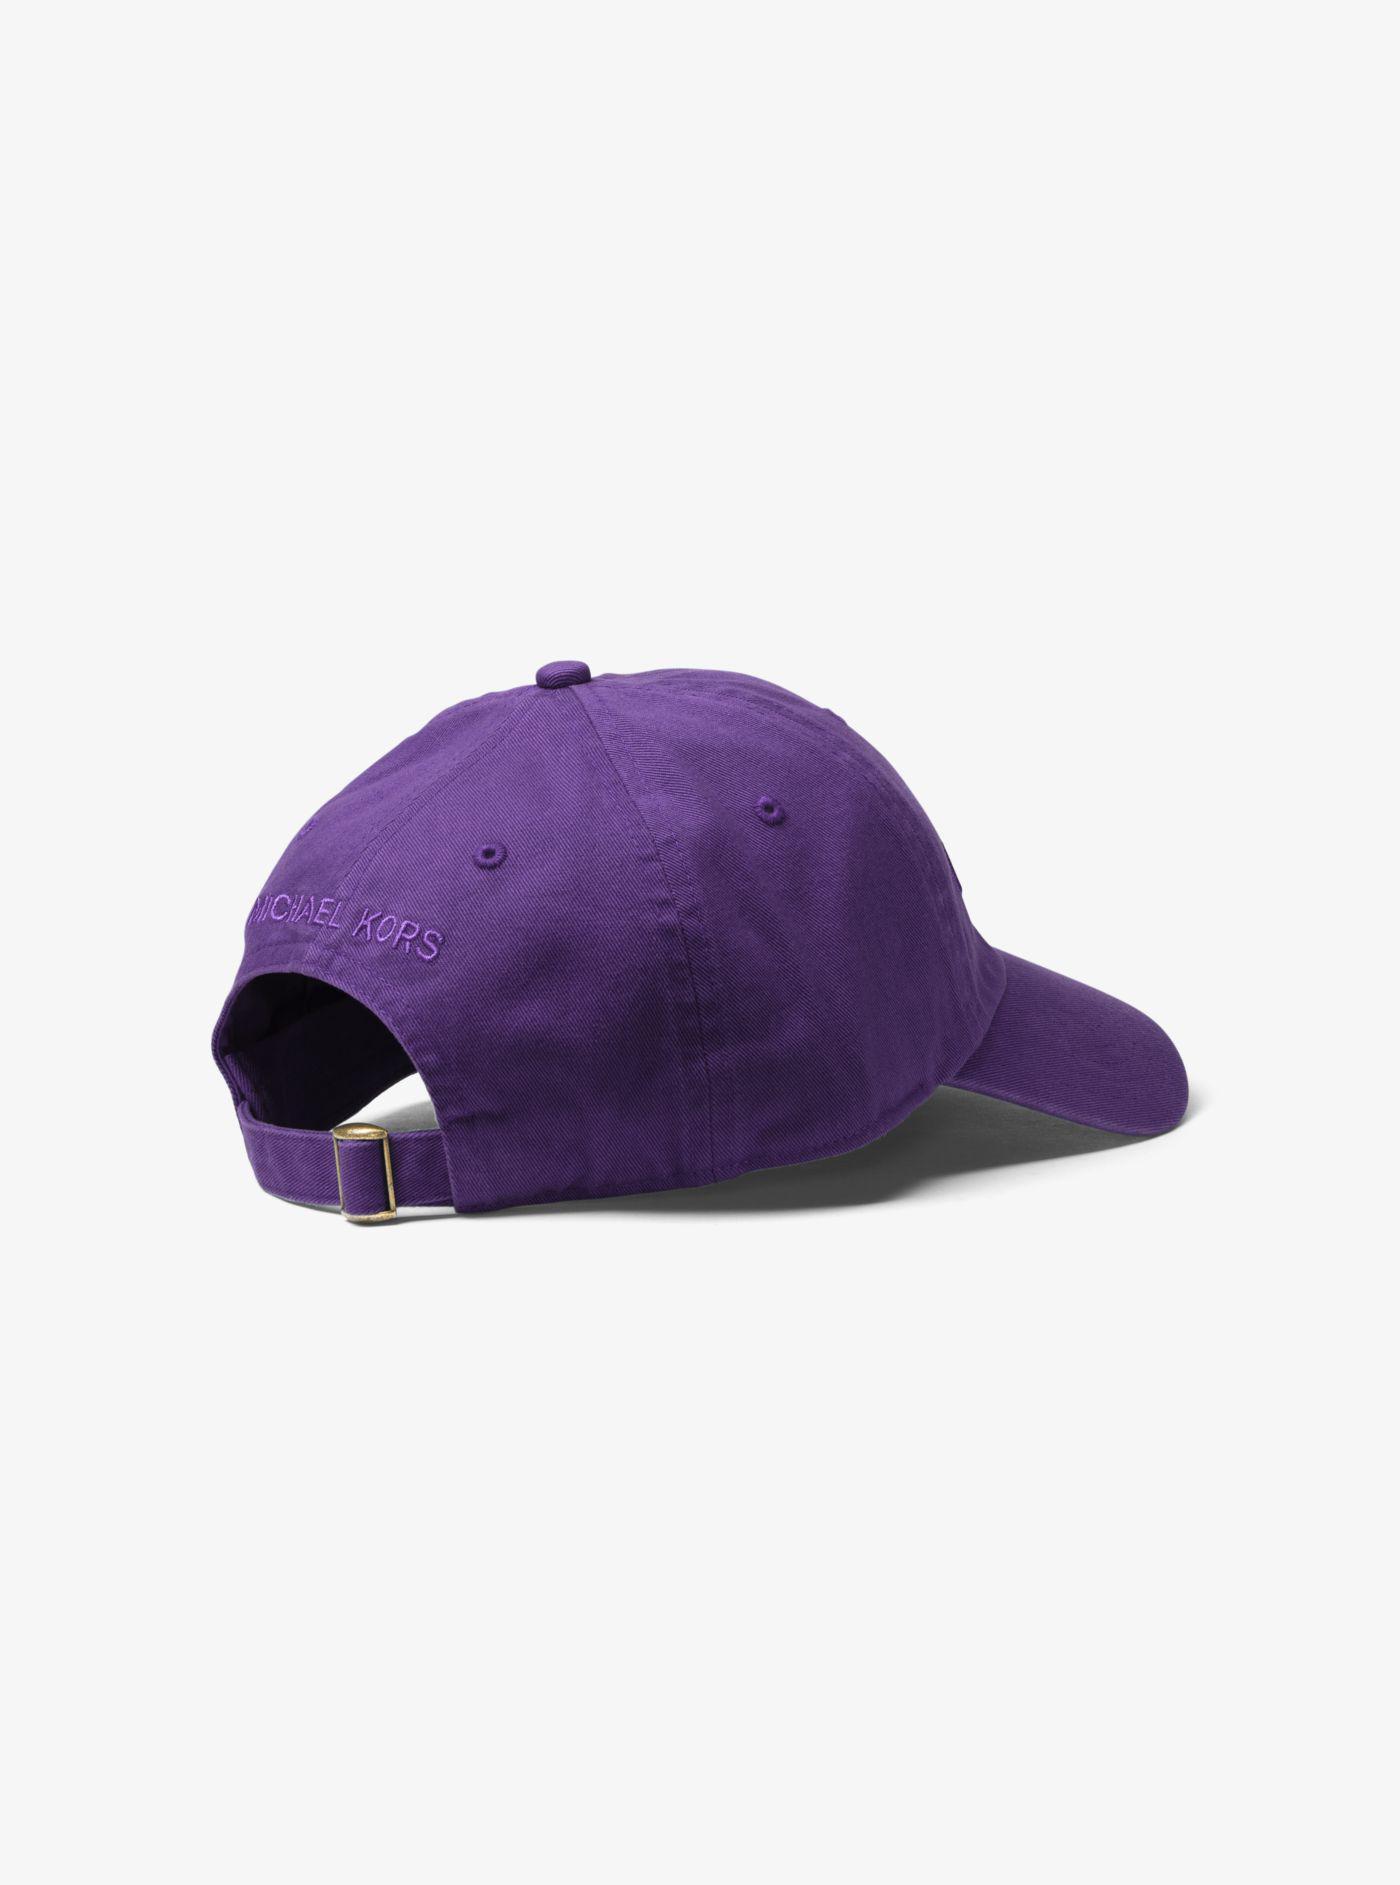 Michael Kors - Purple Logo Cotton Baseball Hat for Men - Lyst. View  fullscreen 1e993f25c71e